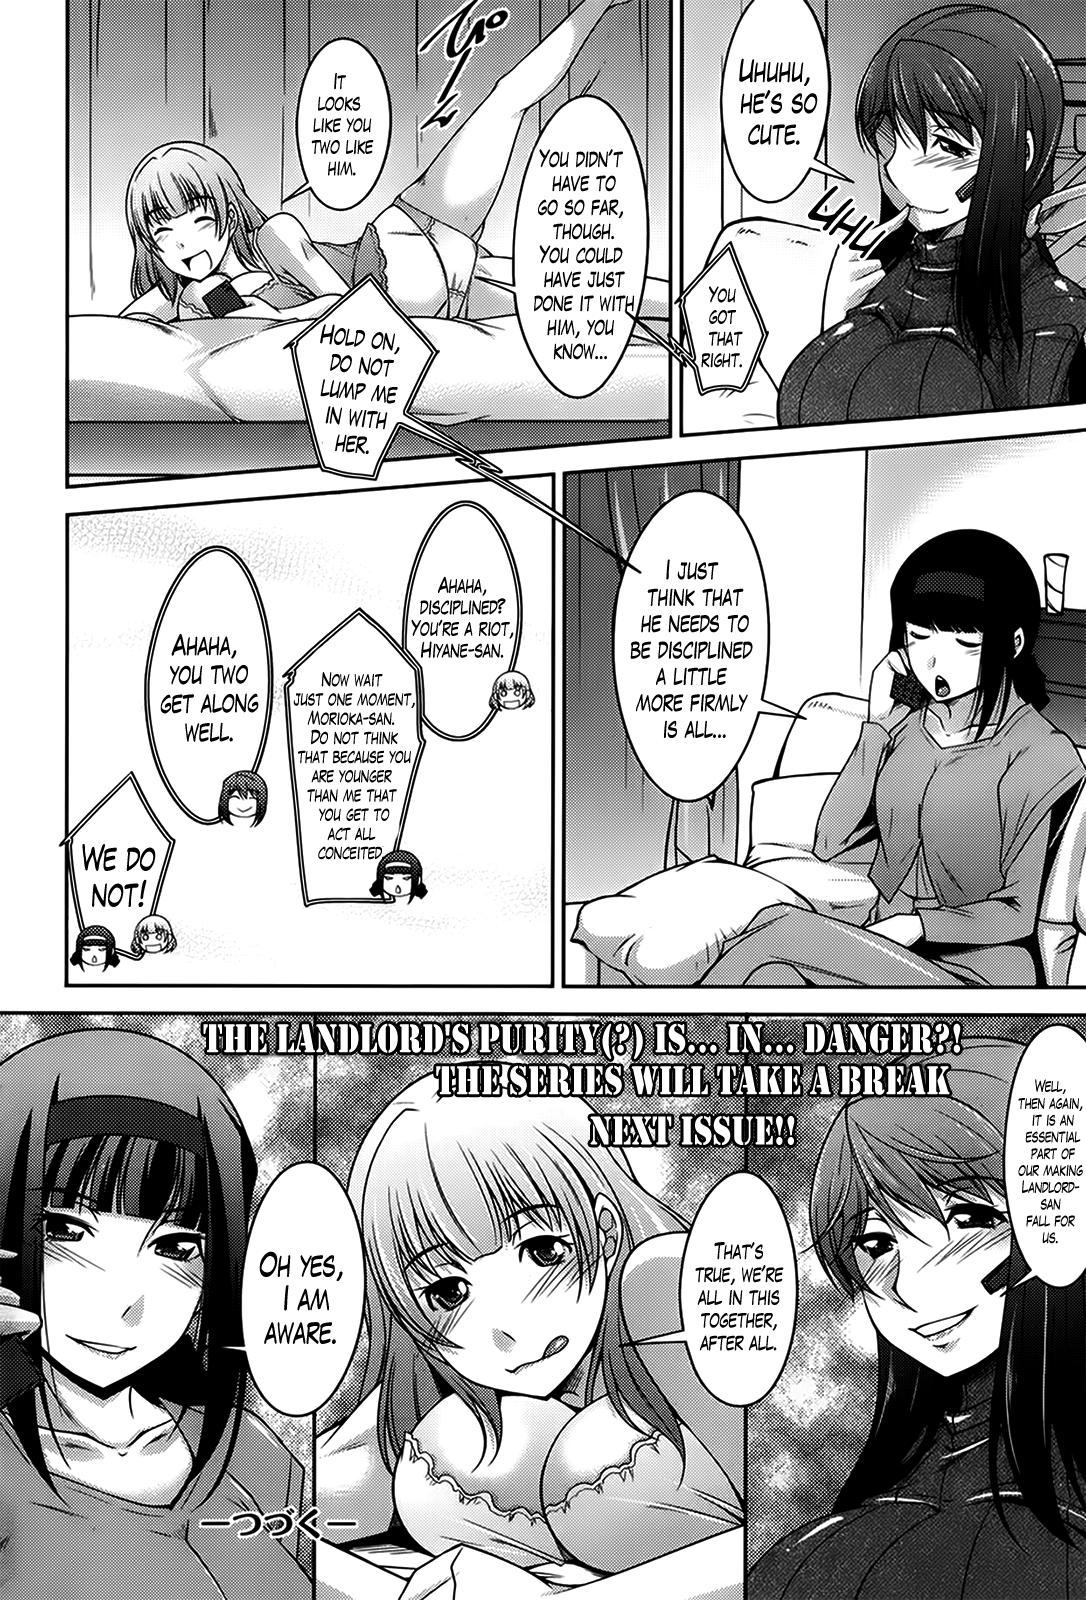 [Zen9] Taikutsu na Gogo no Sugoshikata Ch. 1-4   A Way to Spend a Boring Afternoon Ch. 1-4 (Action Pizazz DX 2013-12) [English](hentai2read.com)[Lazarus H] 75